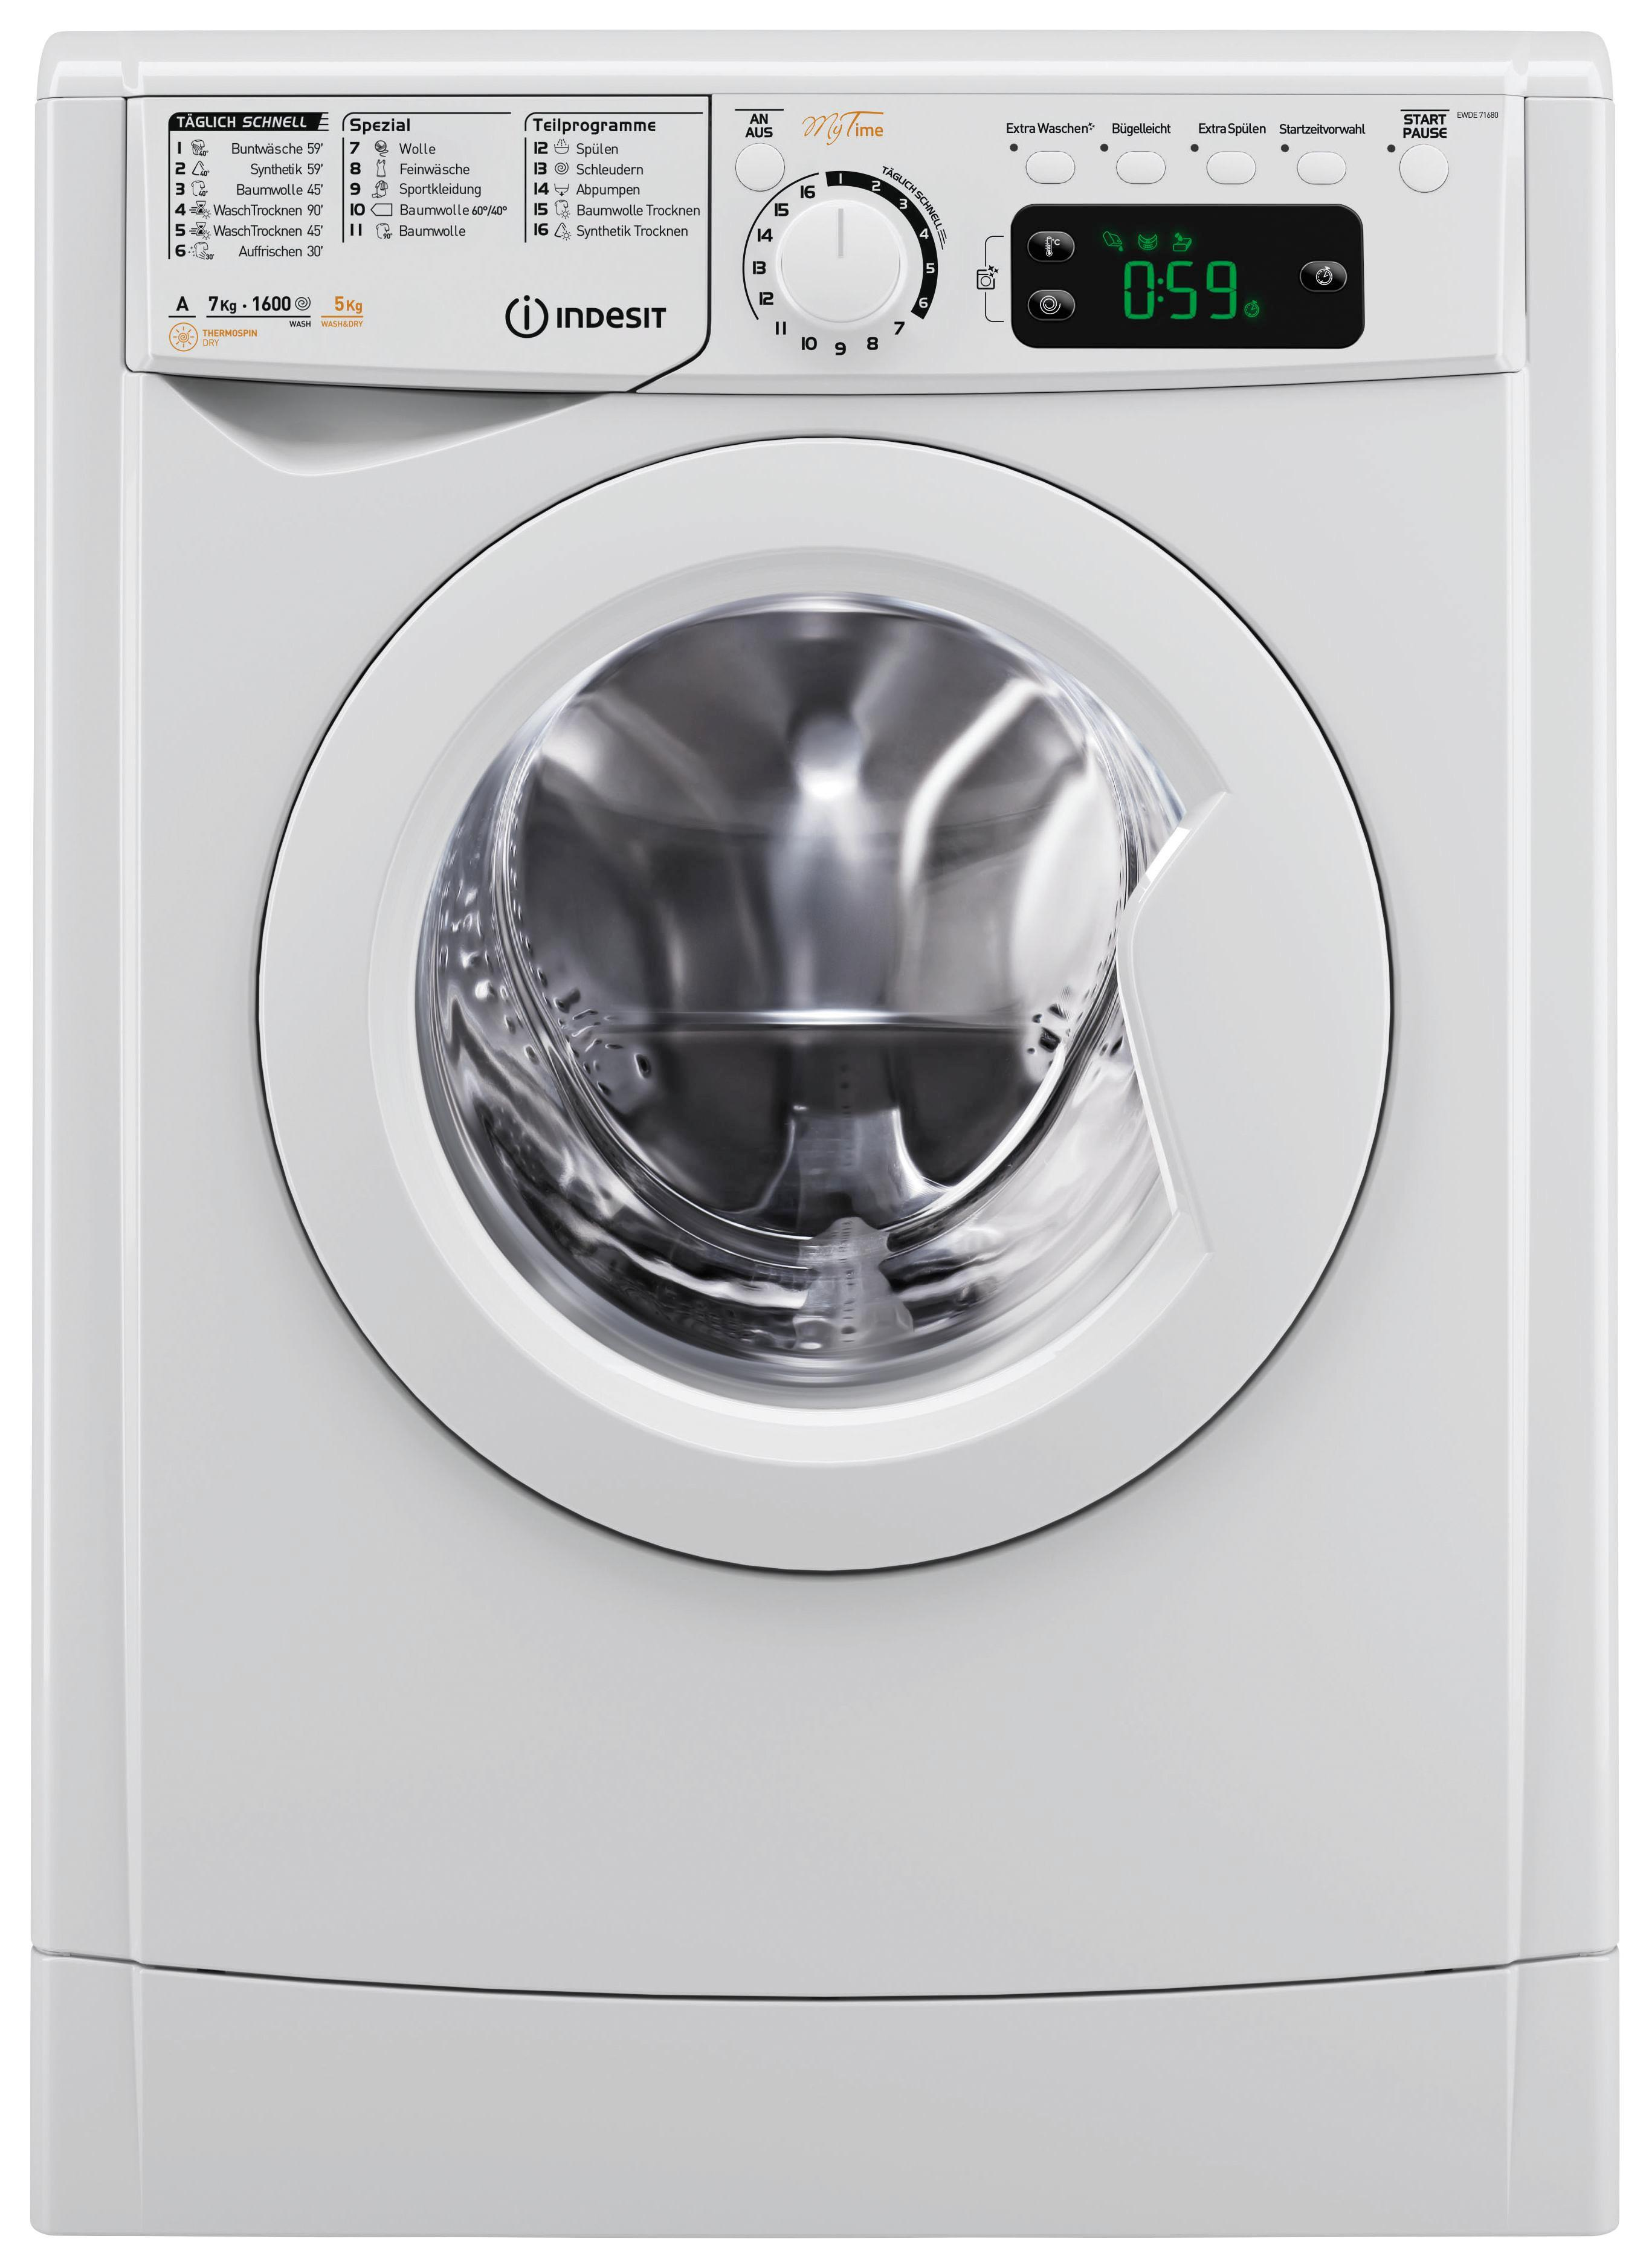 Indesit waschtrockner ewde w de online kaufen ➤ möbelix